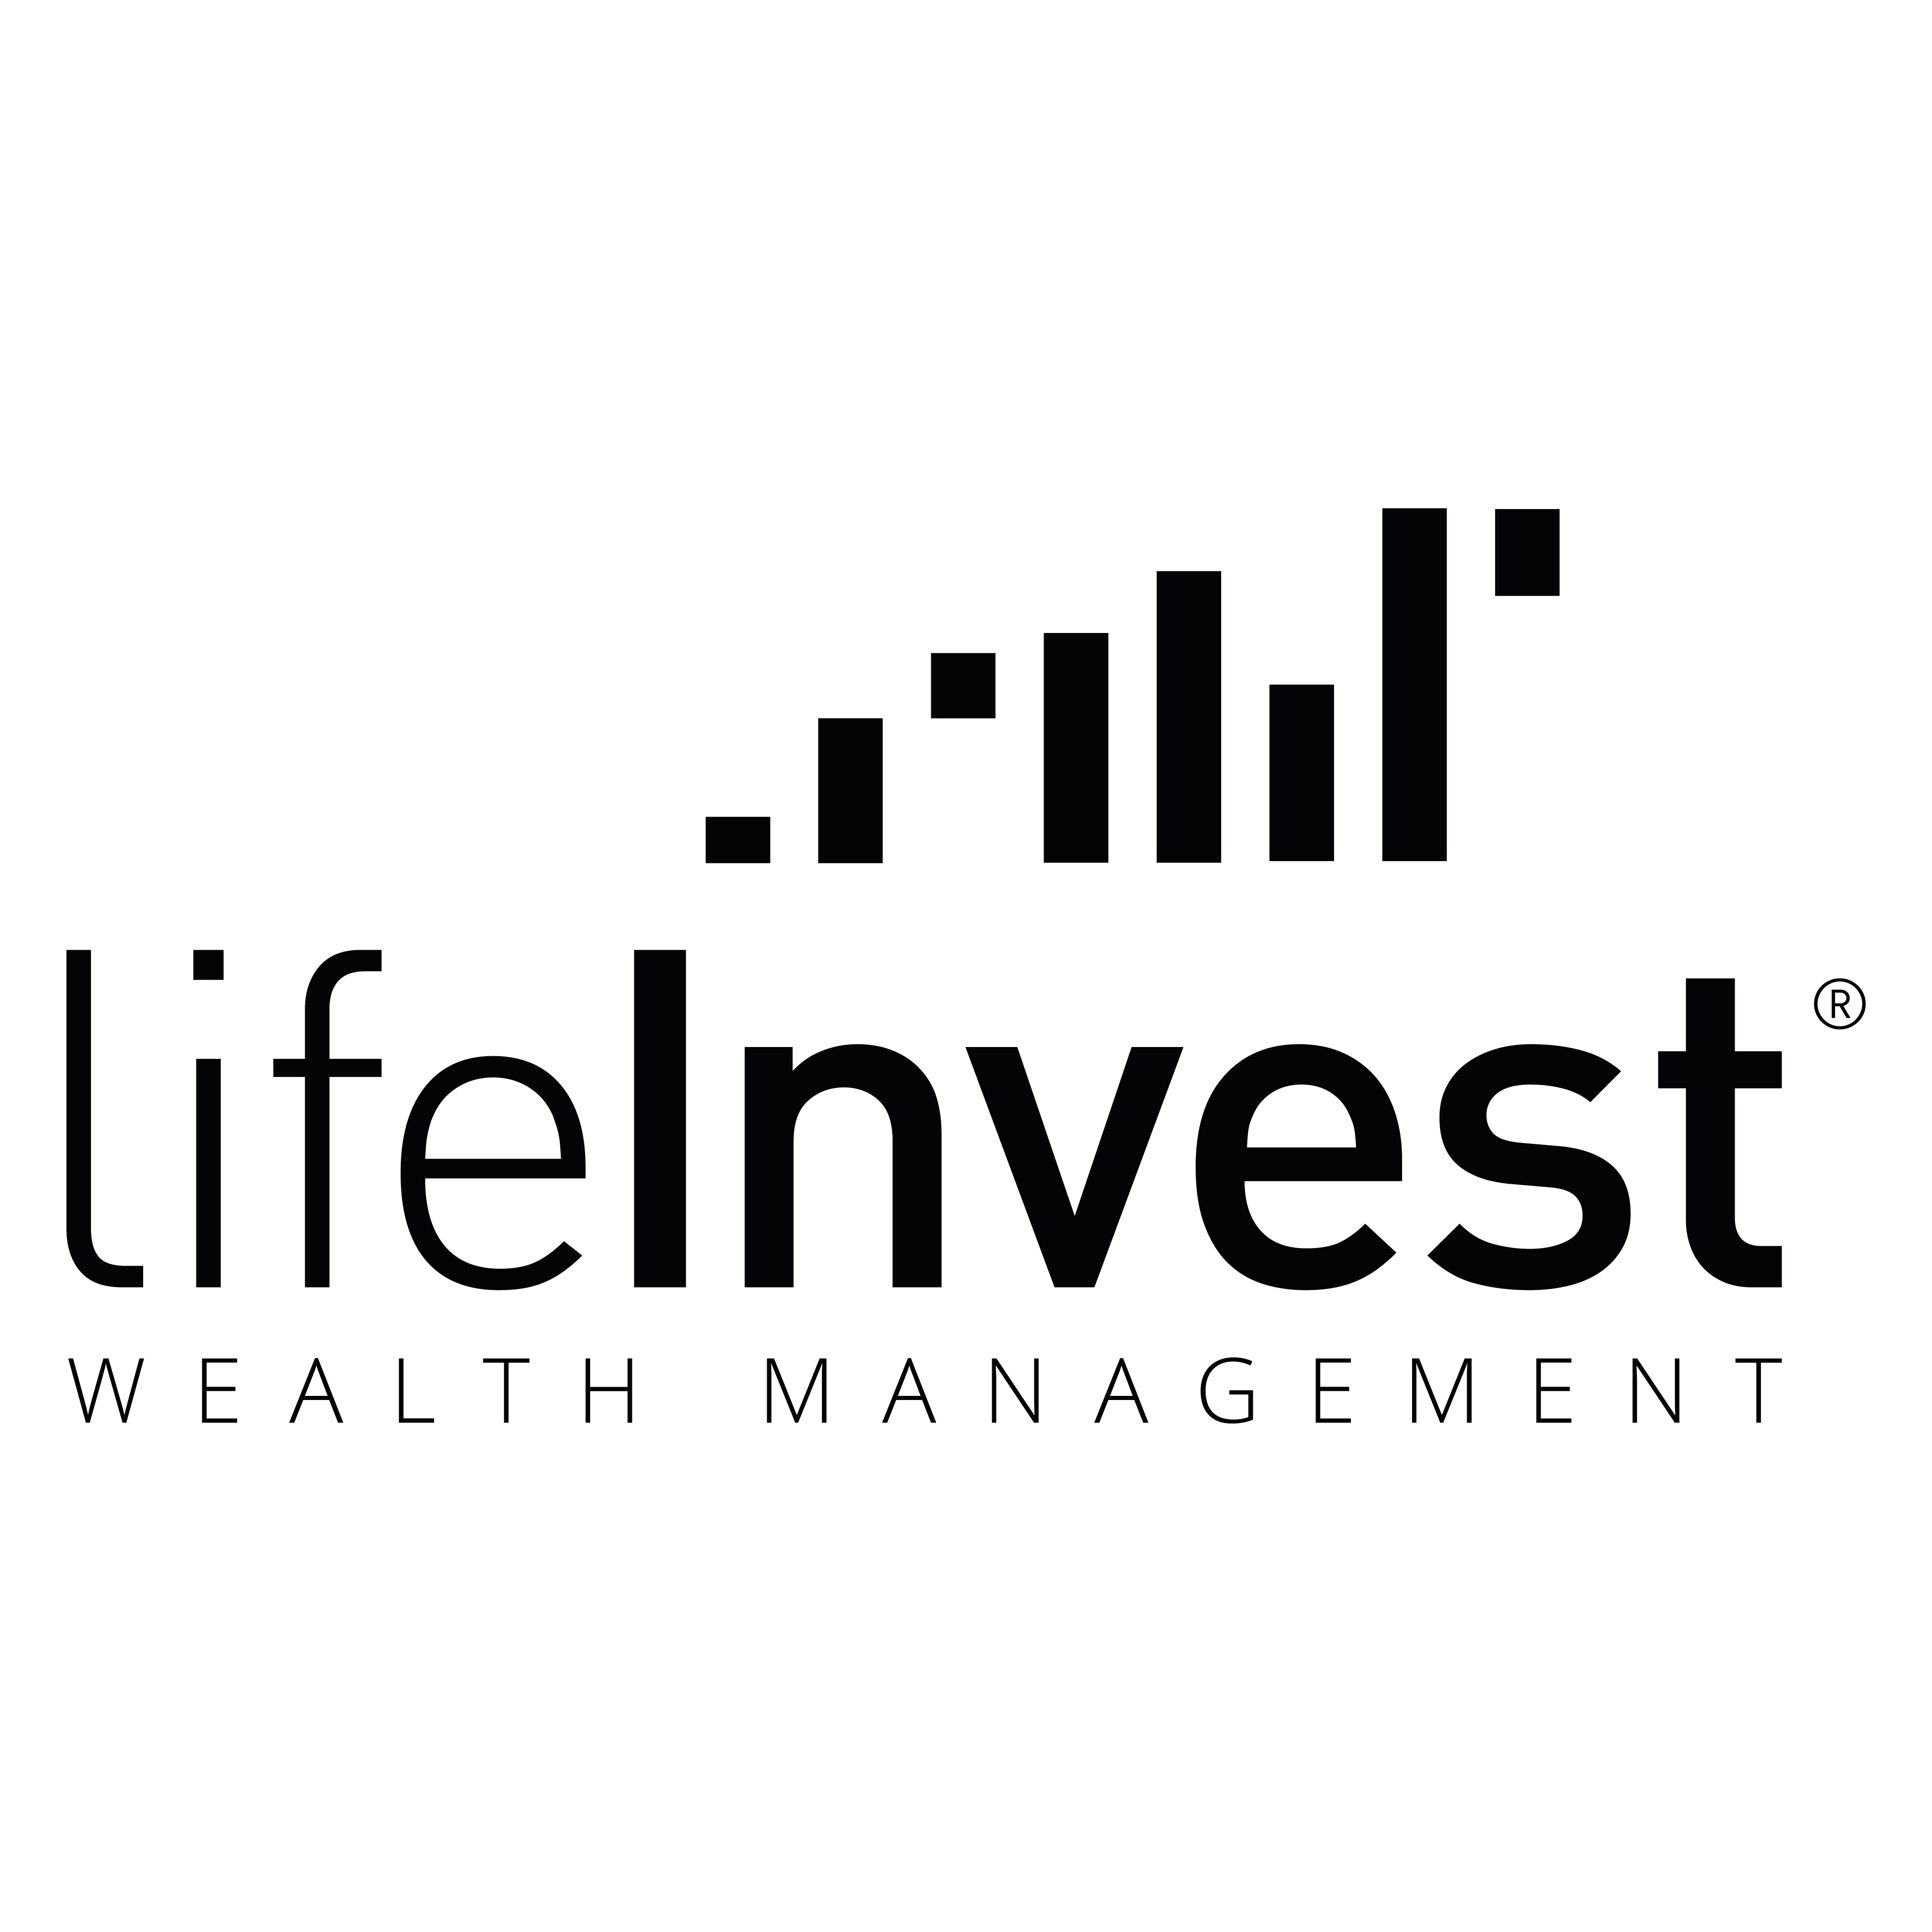 https://cultura-urbana.com/wp-content/uploads/2021/01/Logo-LifeInvest-Wealth-Management.png